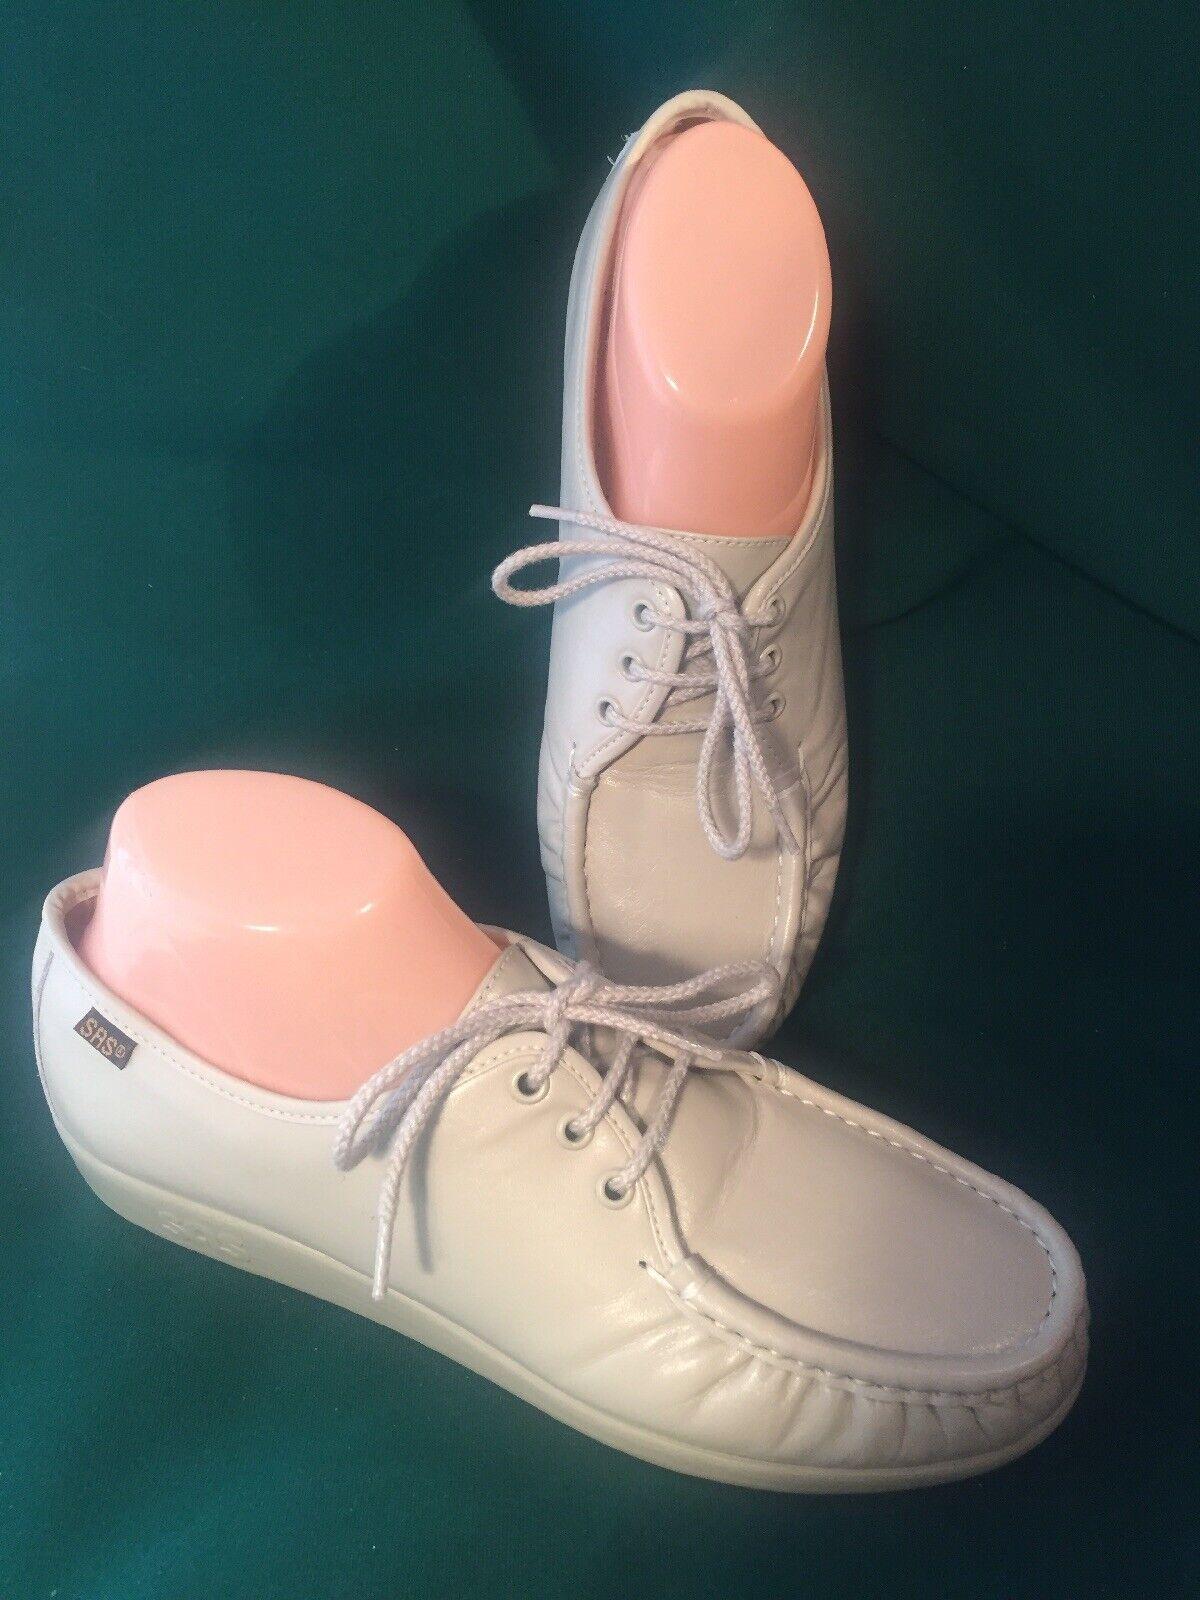 SAS 9.5 M bone tie shoes free time walkers comfort support excellent